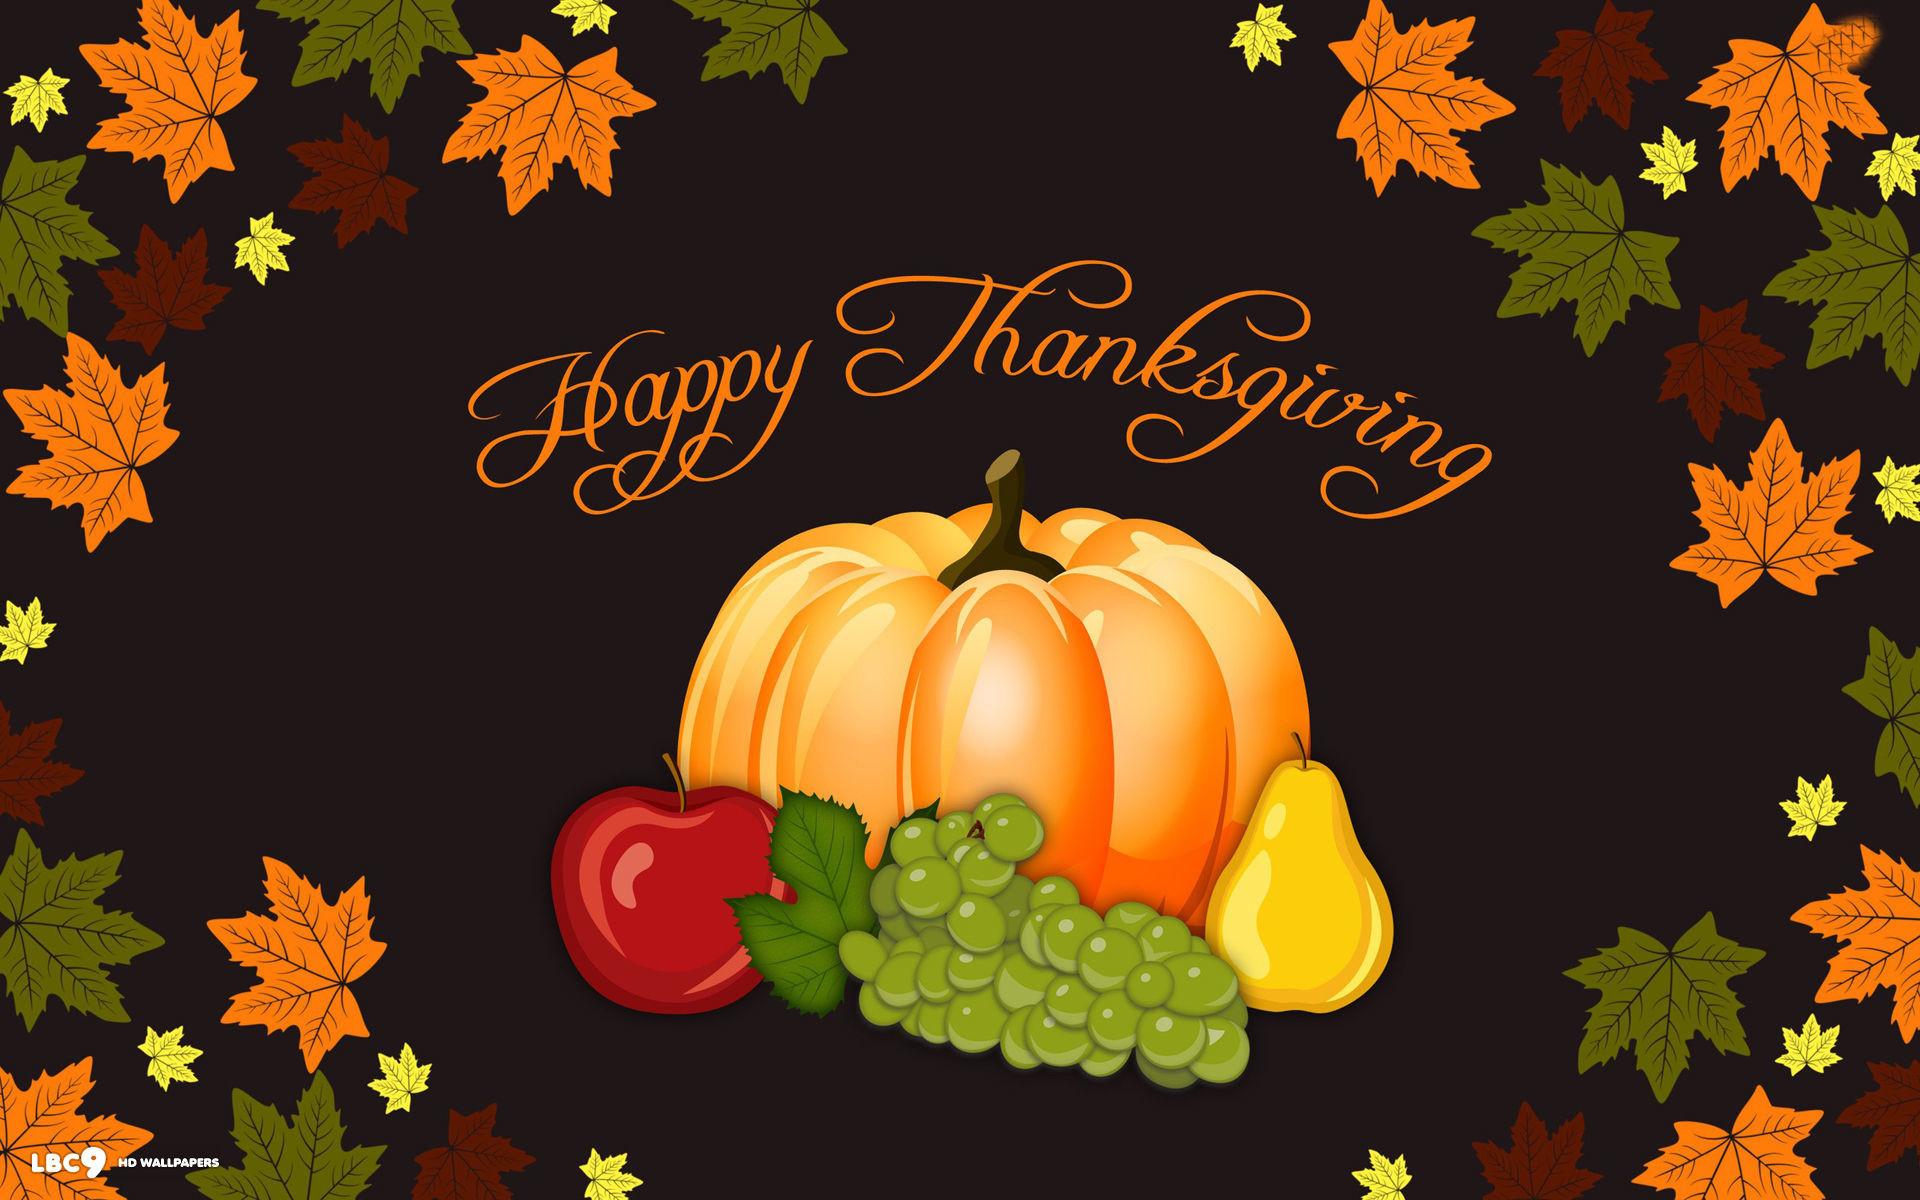 happy thanksgiving day vector art pumpkin autumn leaves holiday wallpaper